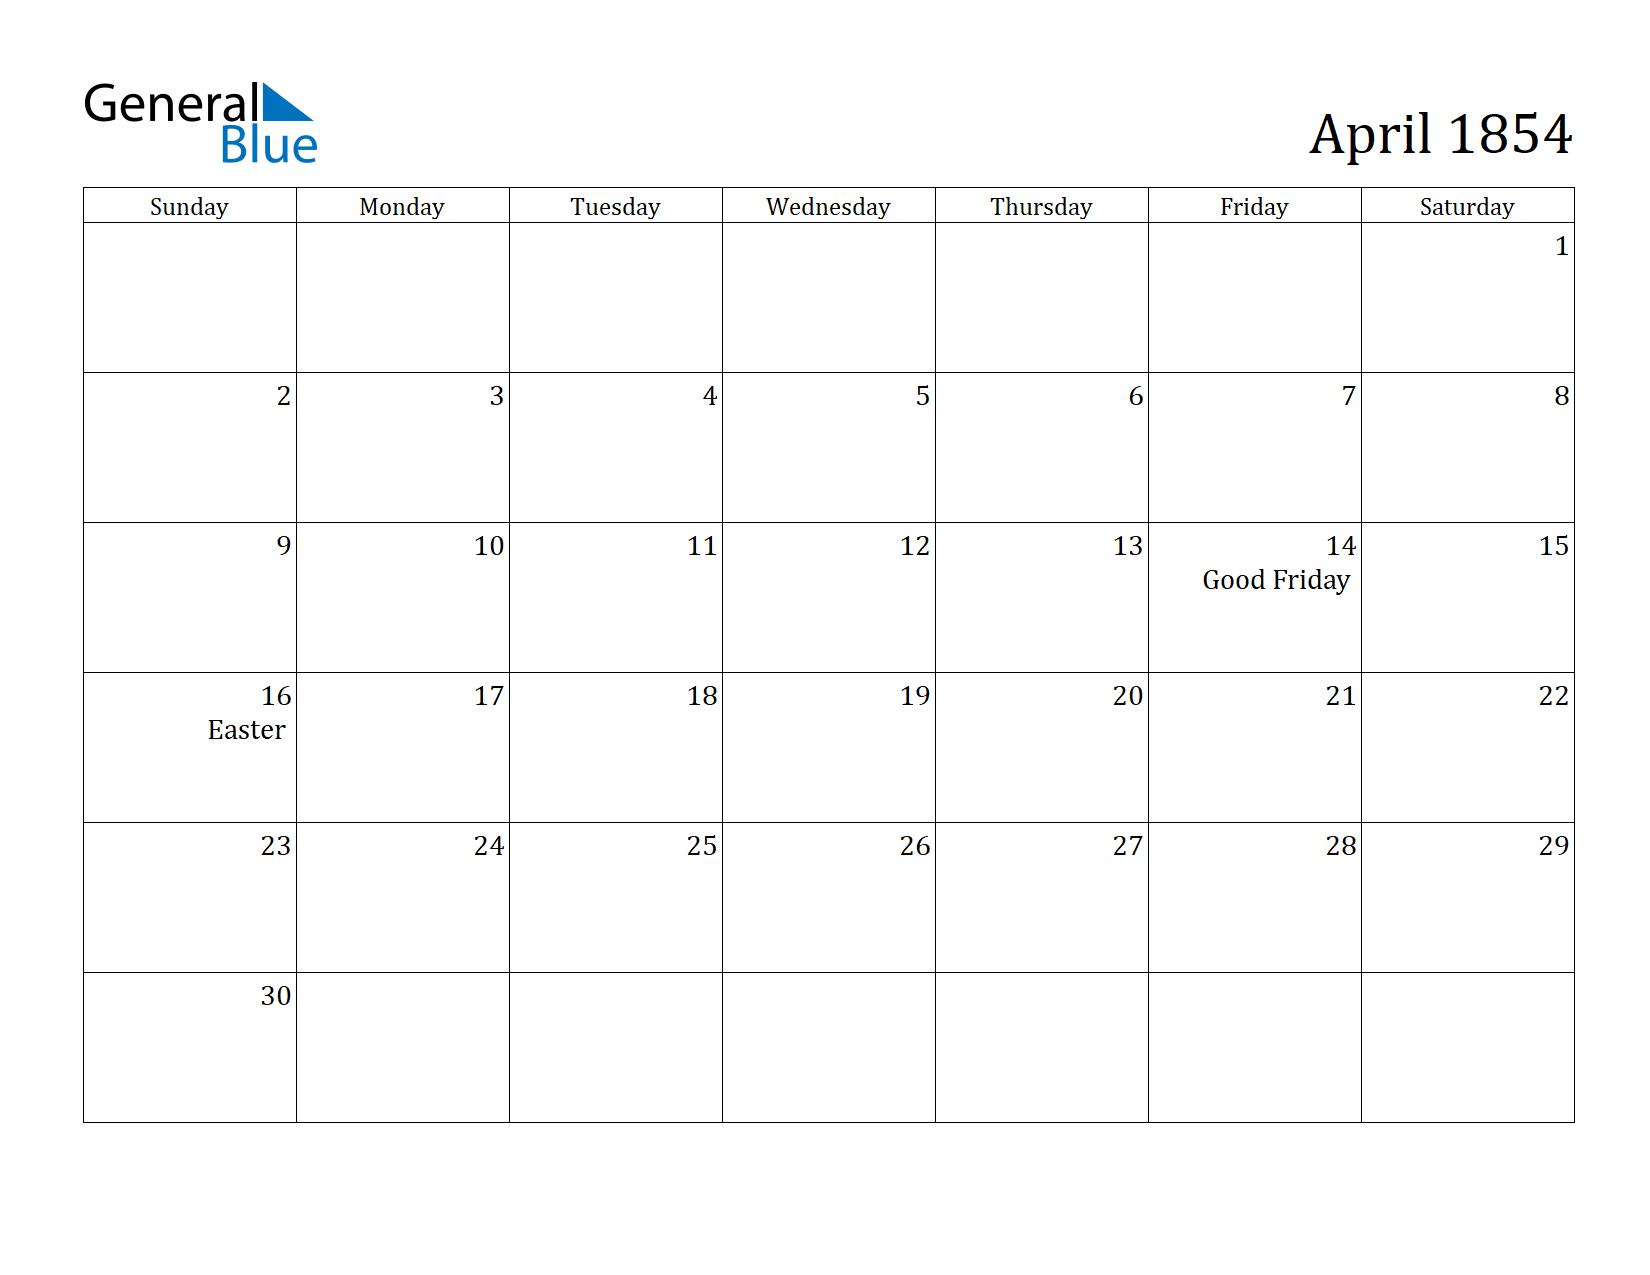 Image of April 1854 Calendar